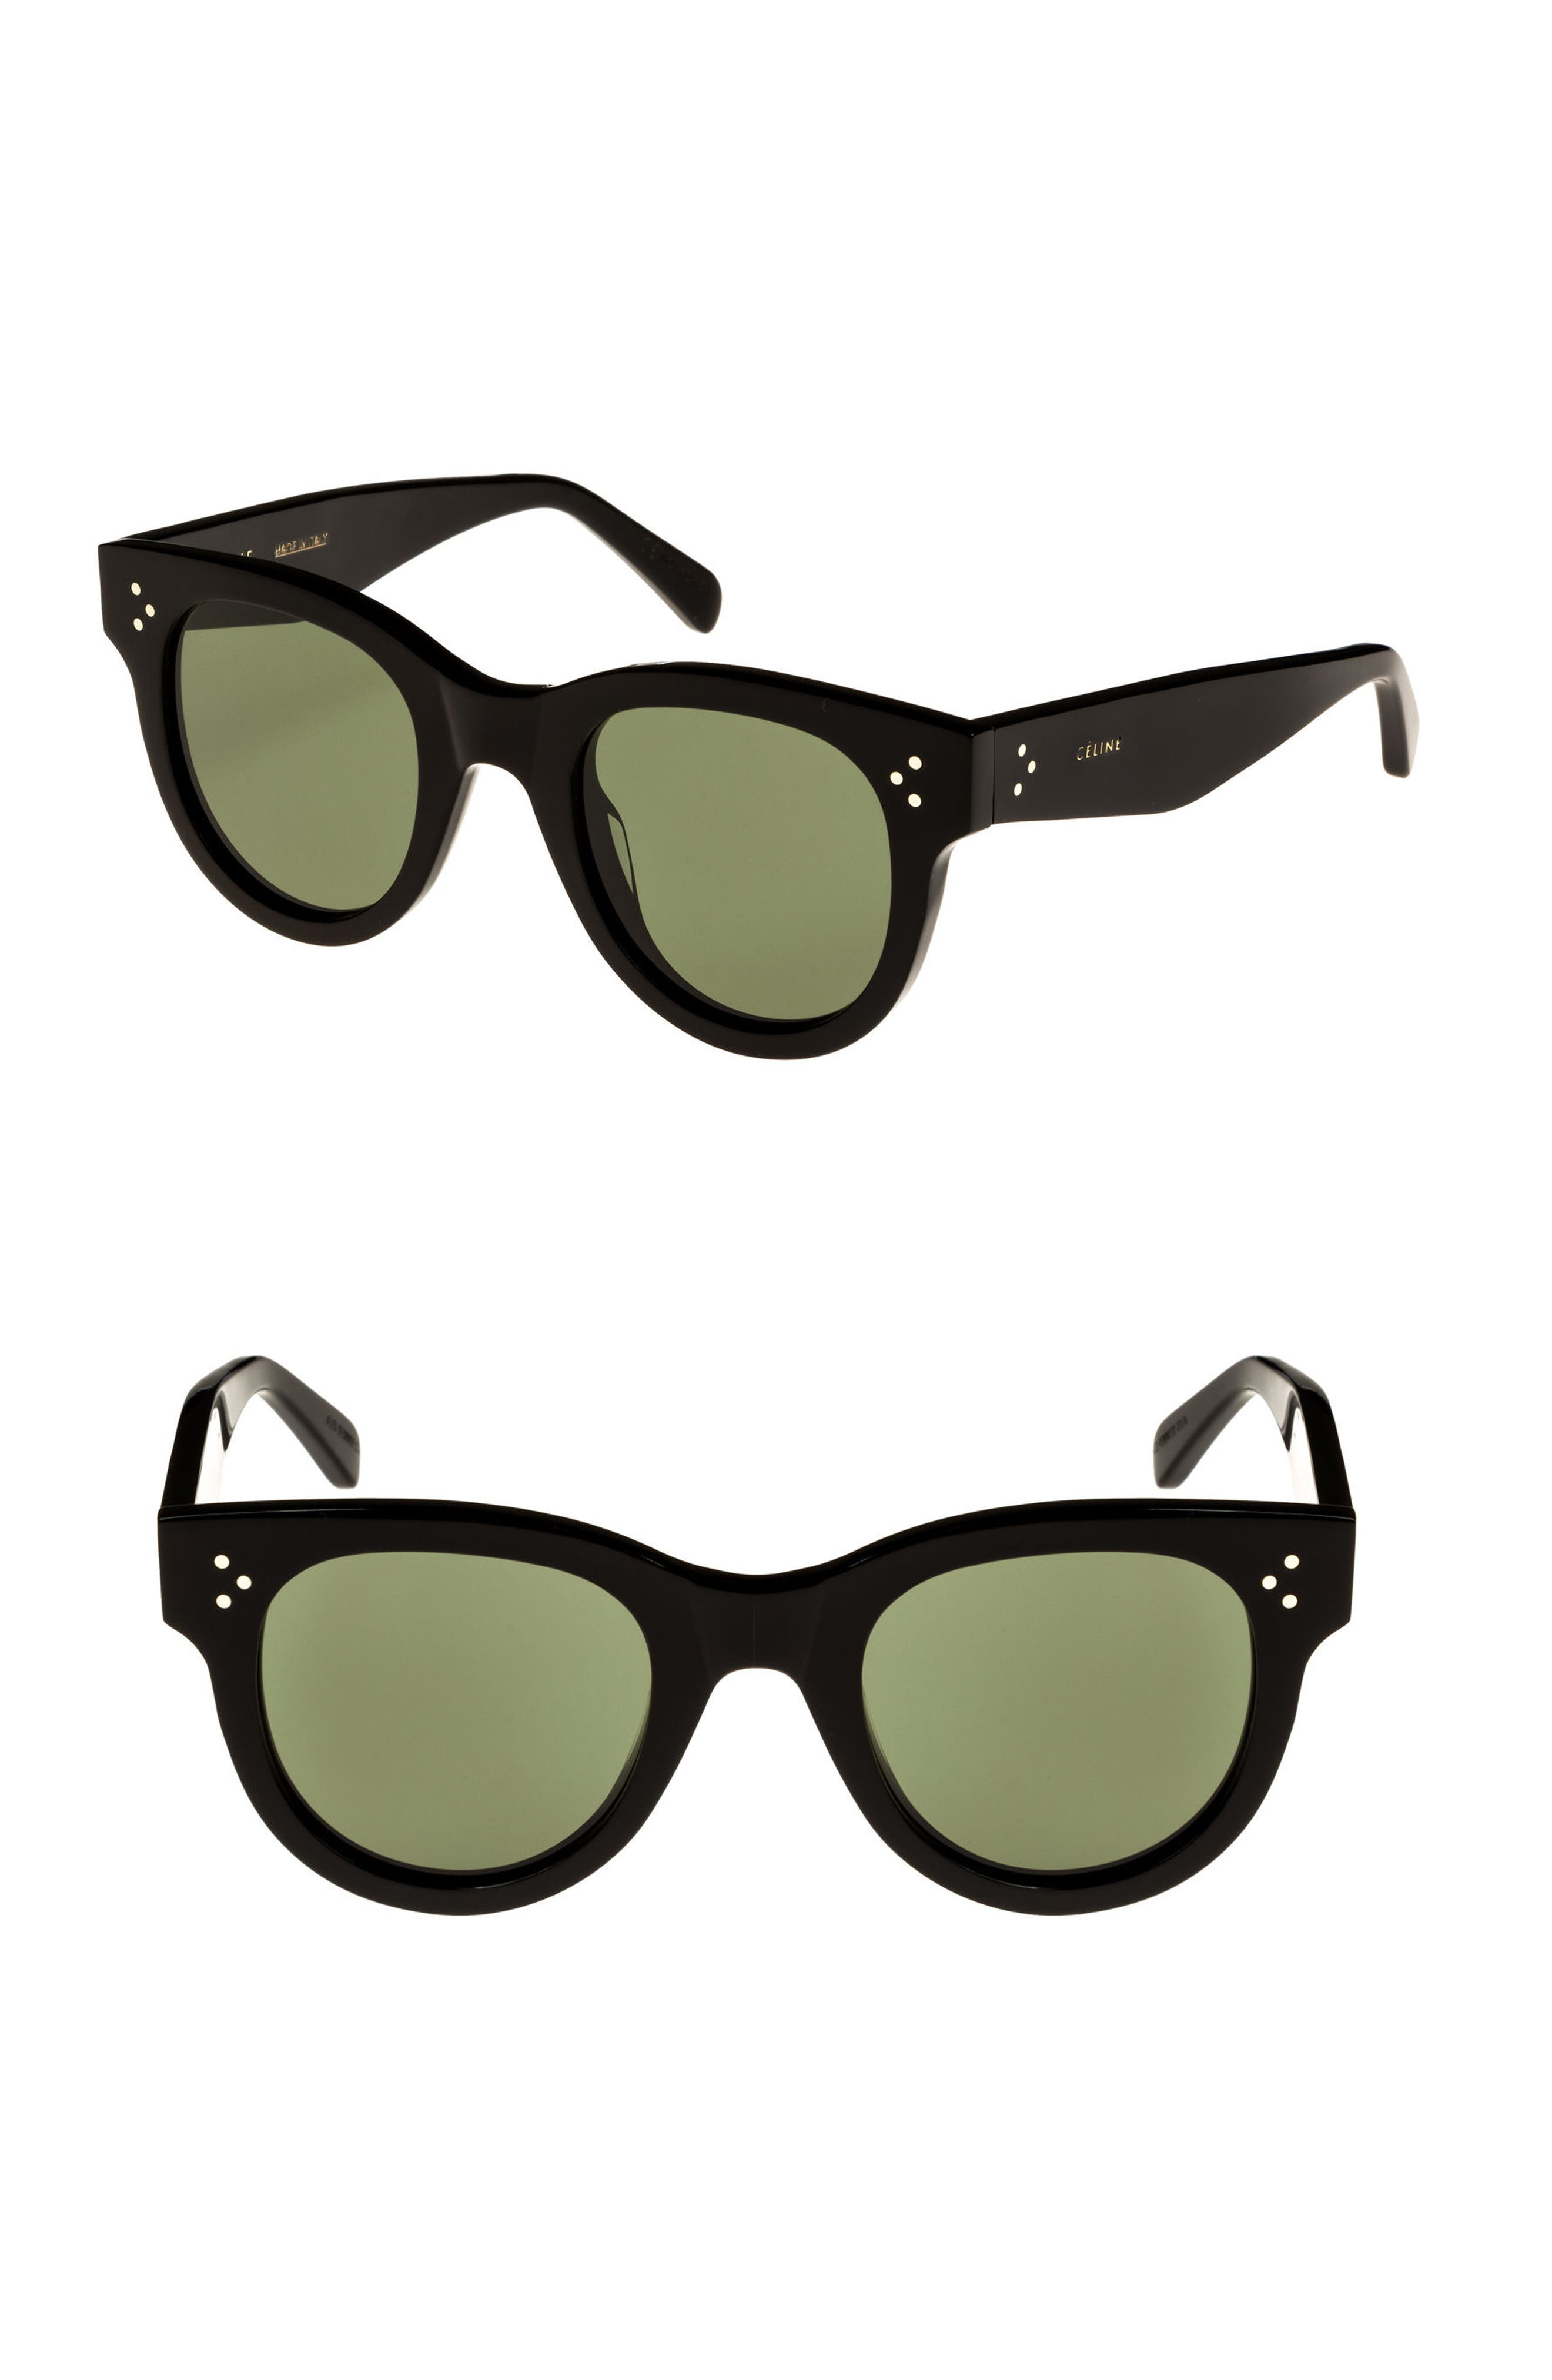 Studded Acetate Sunglasses W/ Mineral Lenses, Black in Black/ Green